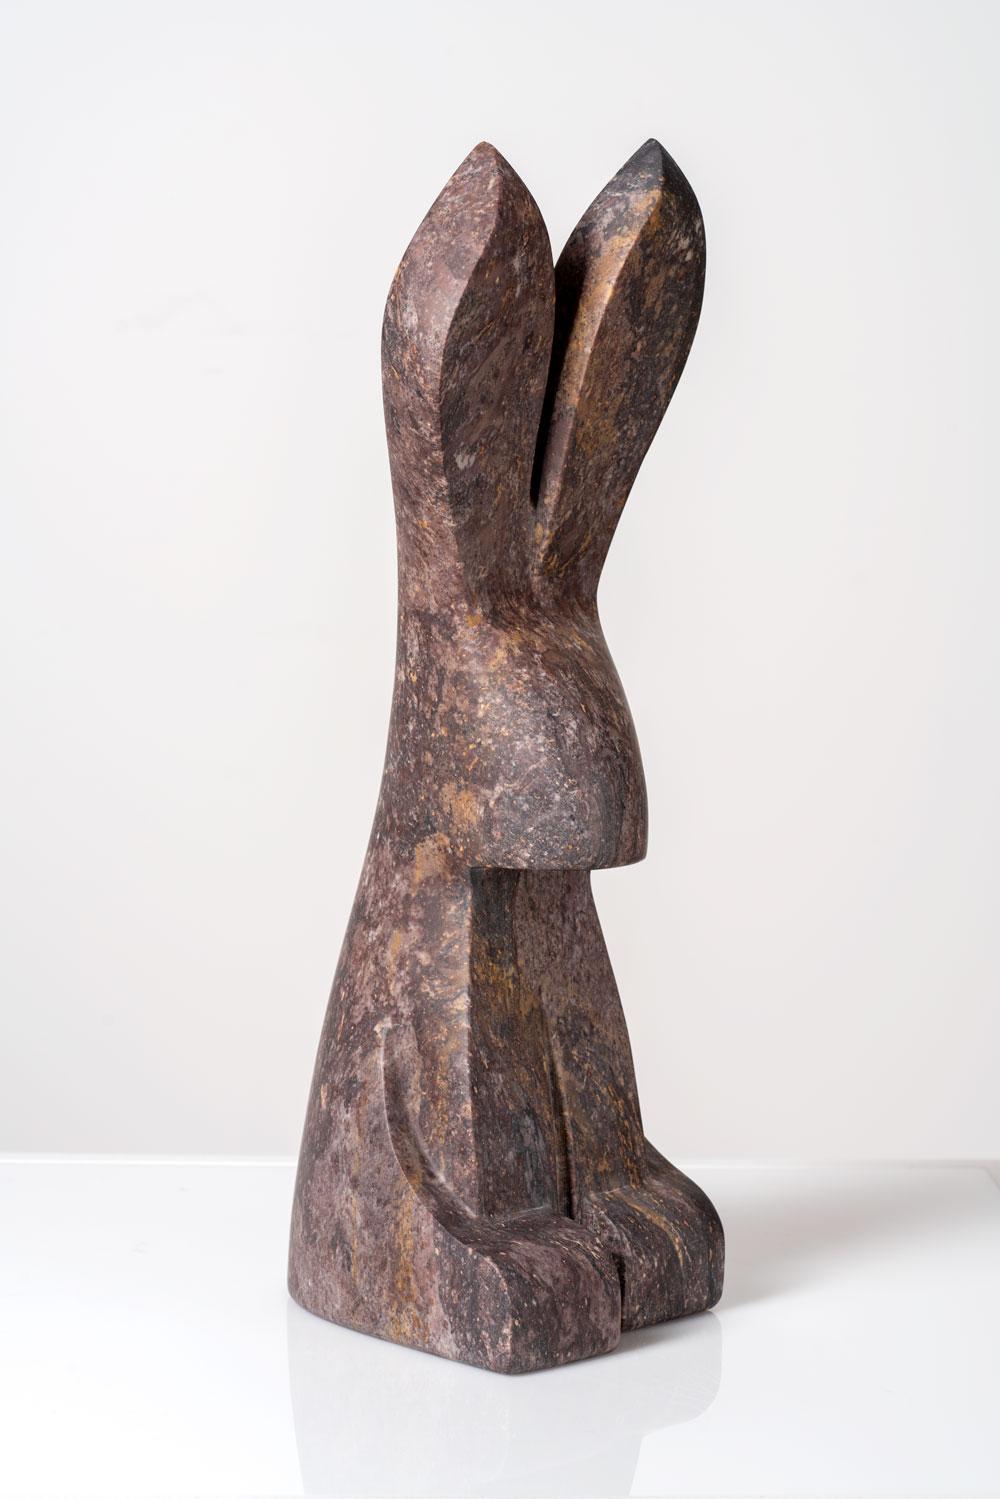 "The Curious Rabbit   Wonderstone (Utah)  5"" W x 6"" L x 15"" H  Jason Carter, 2018  SOLD"